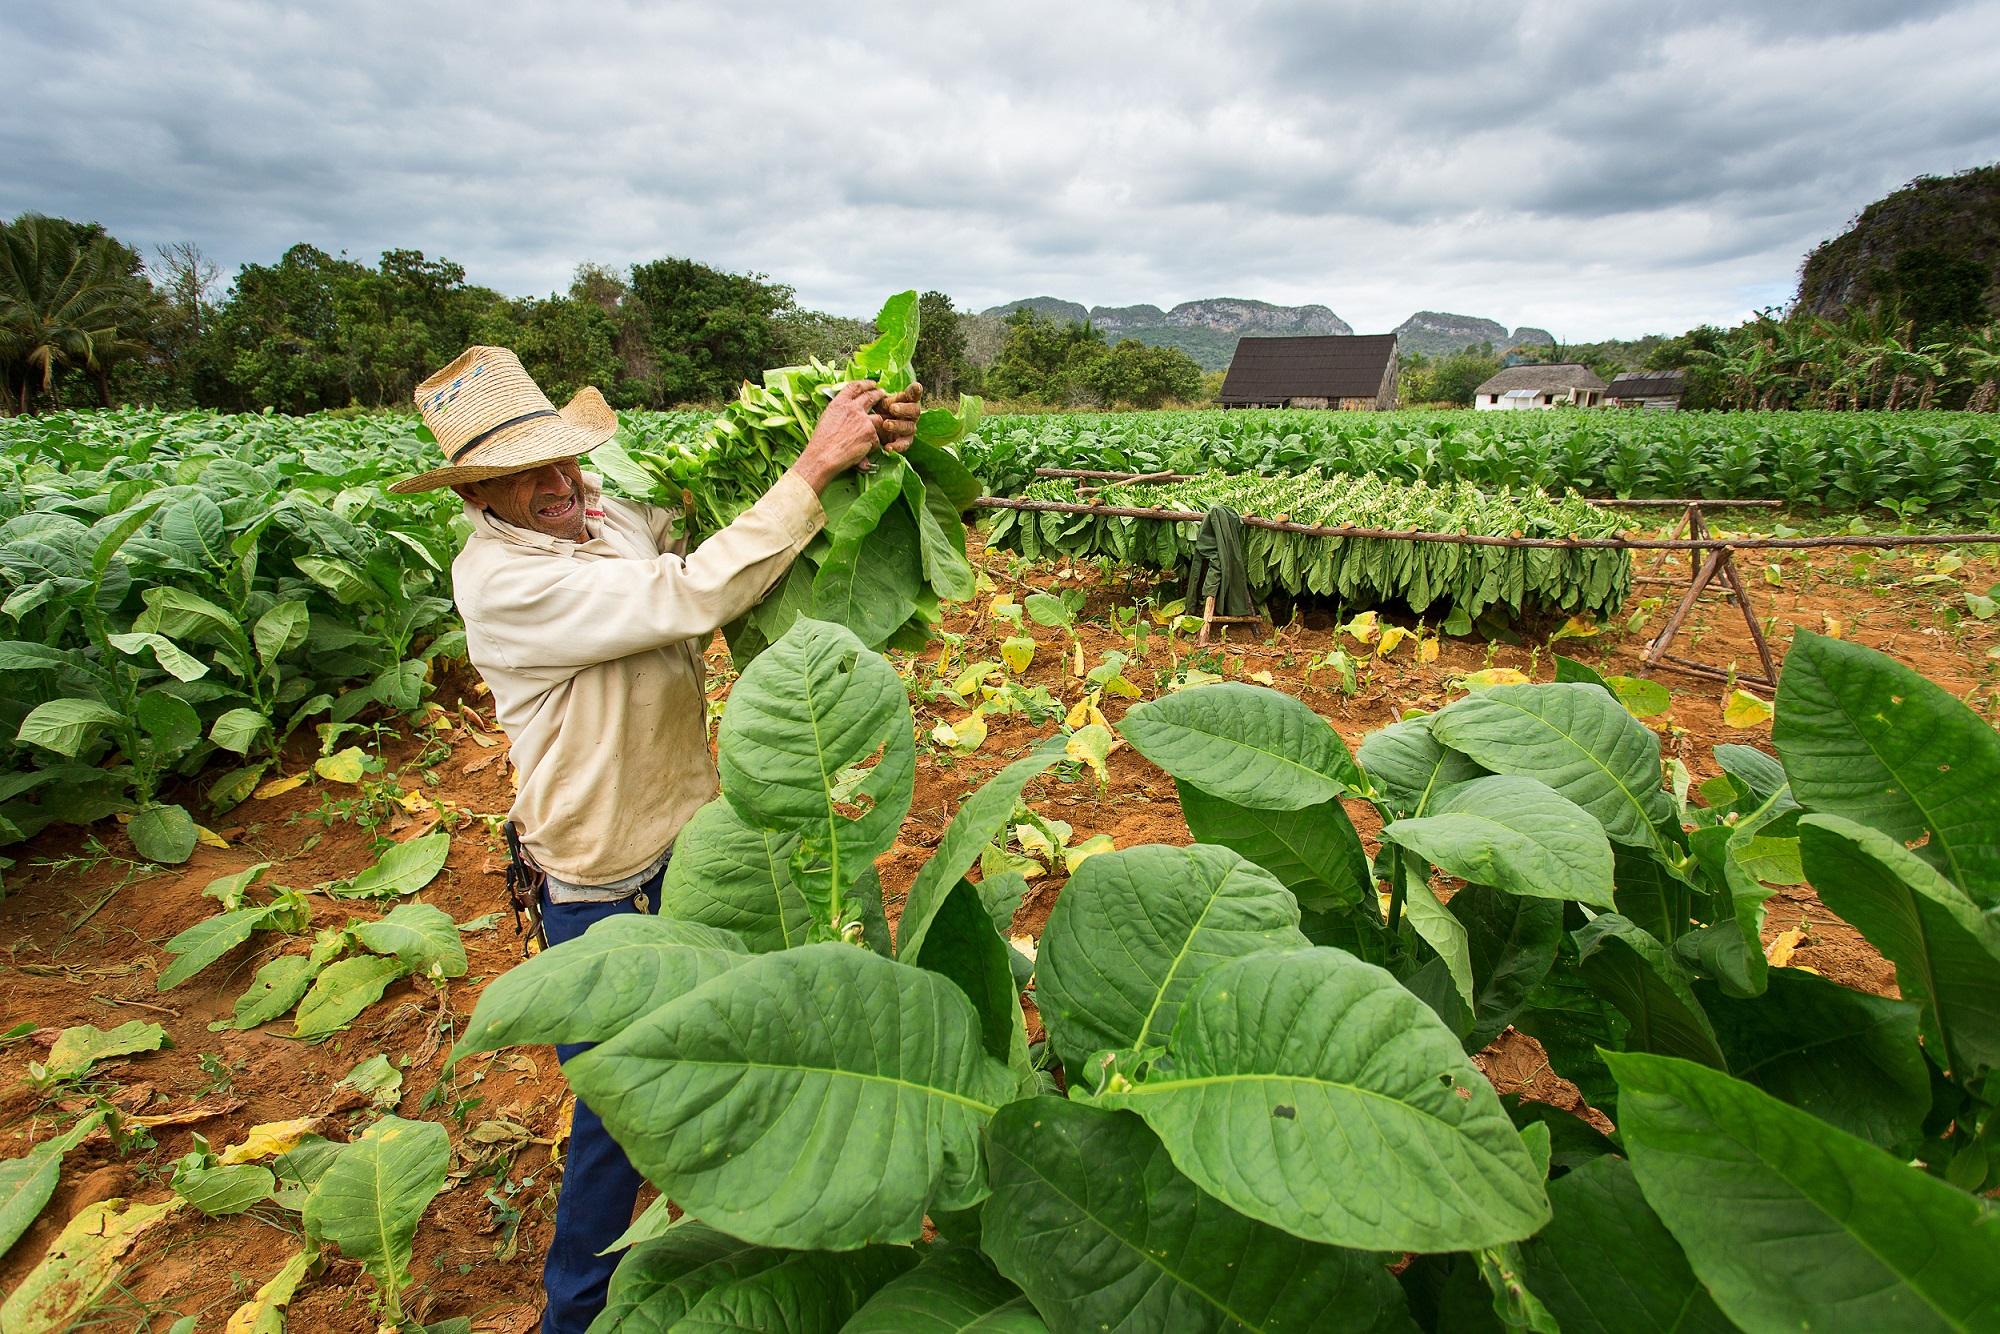 A Cuban Tobbaco farm